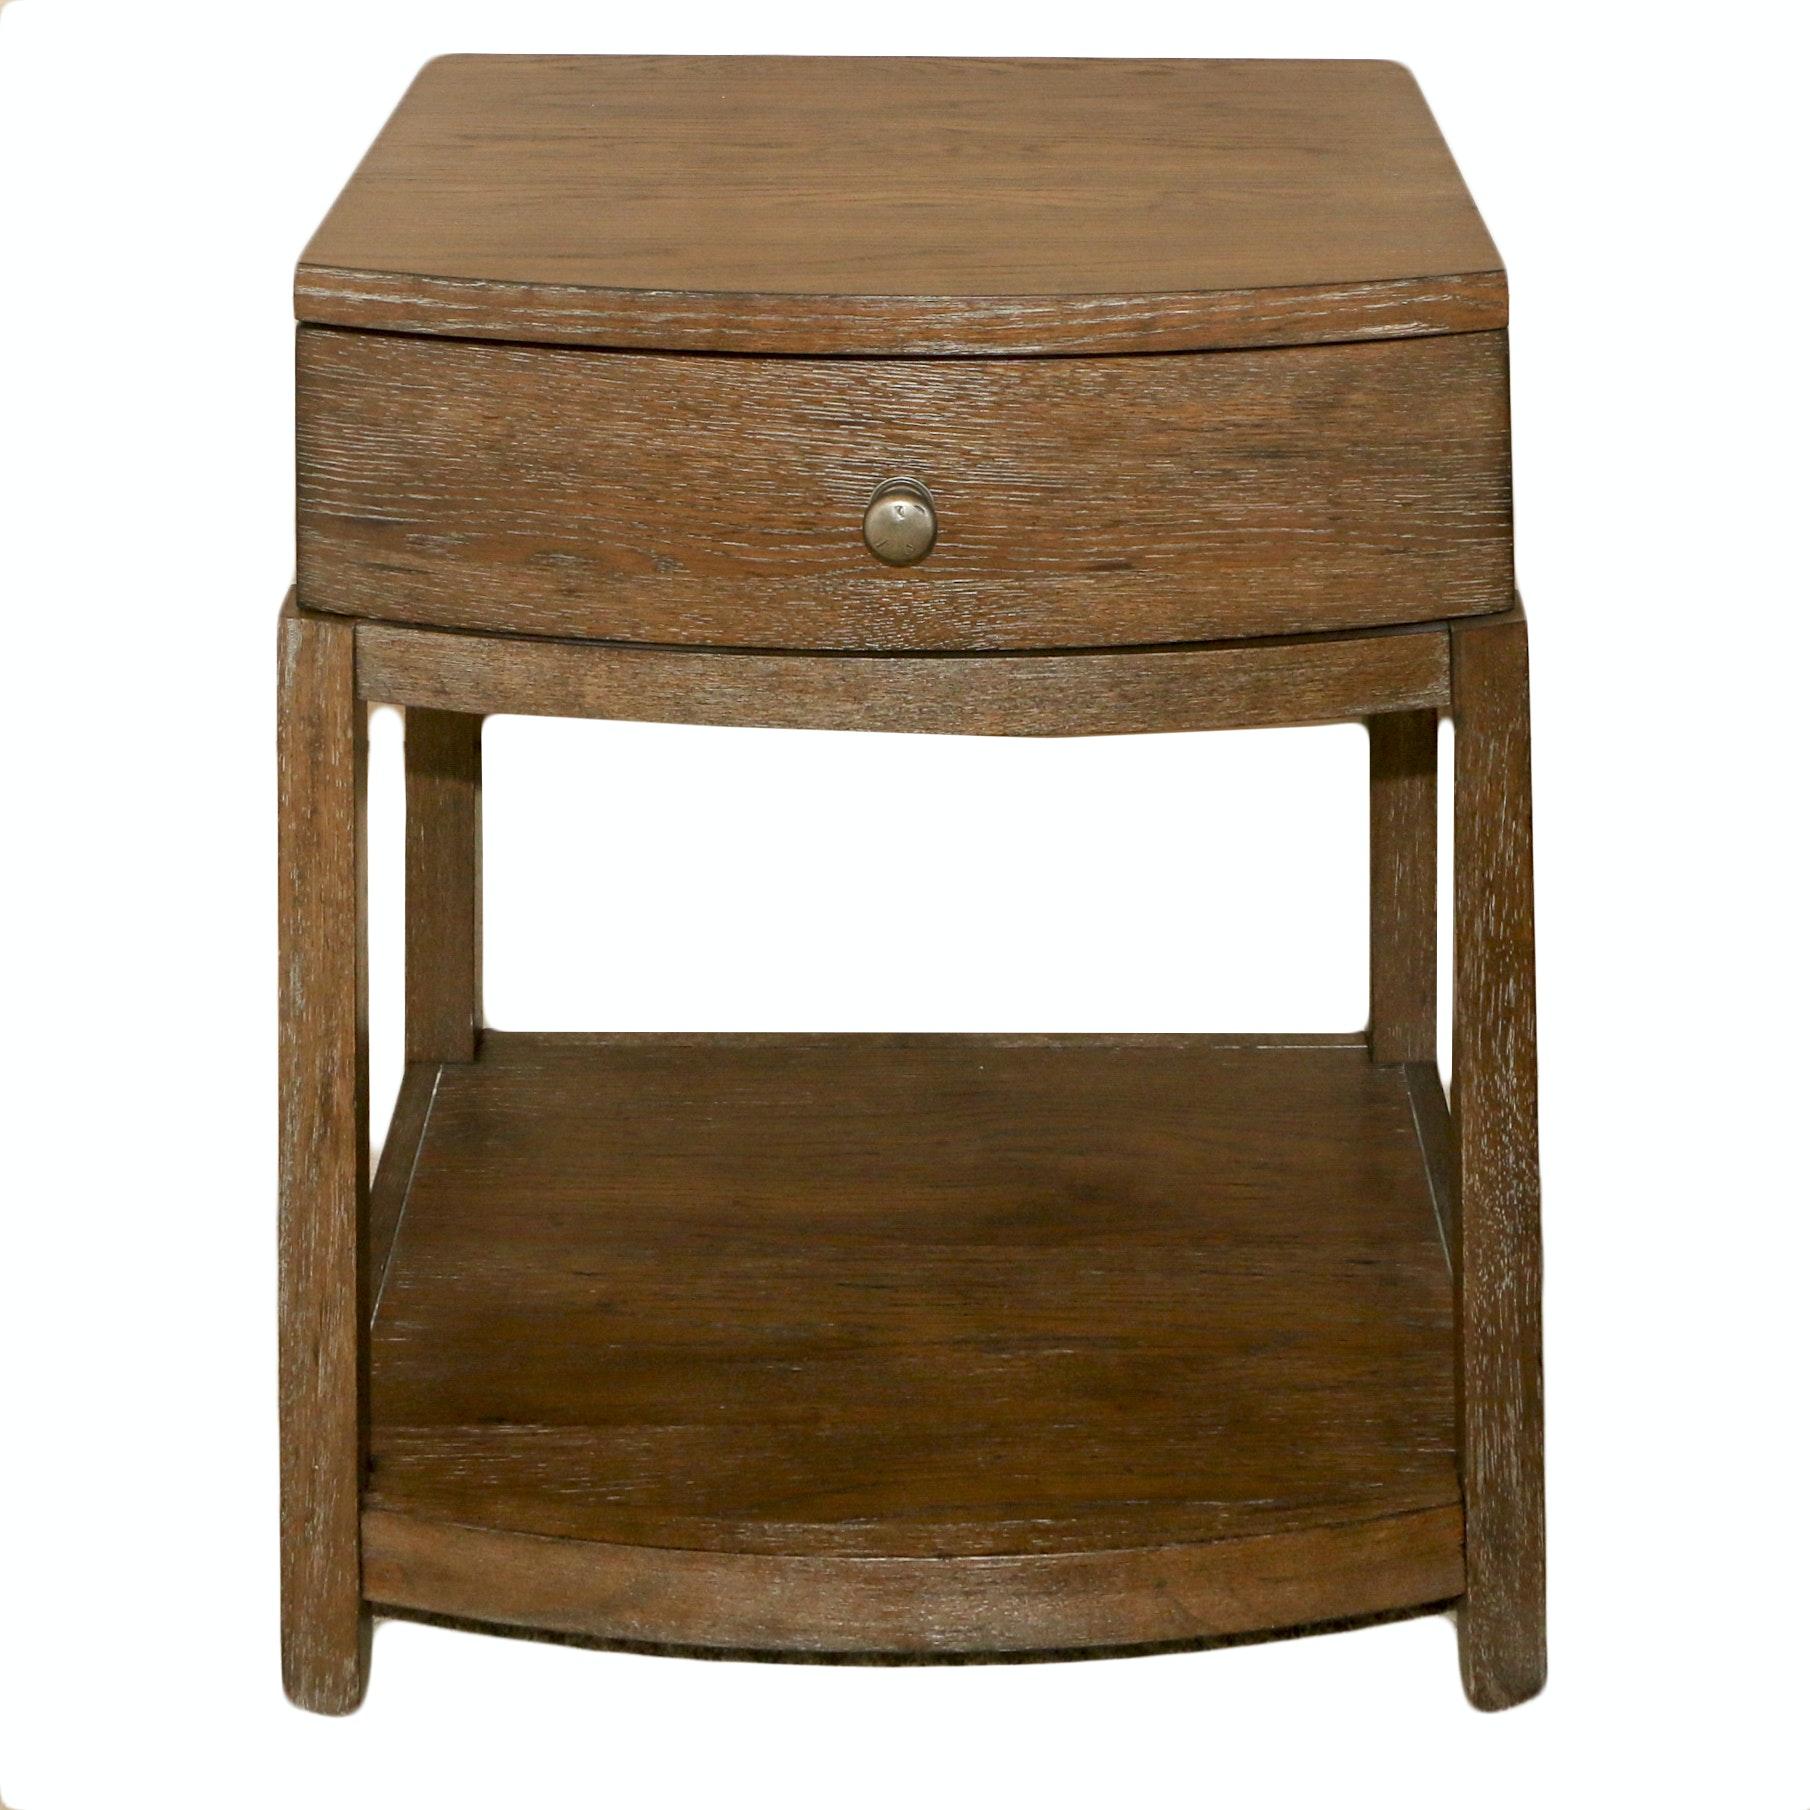 Wooden Nightstand by Bassett, 21st Century